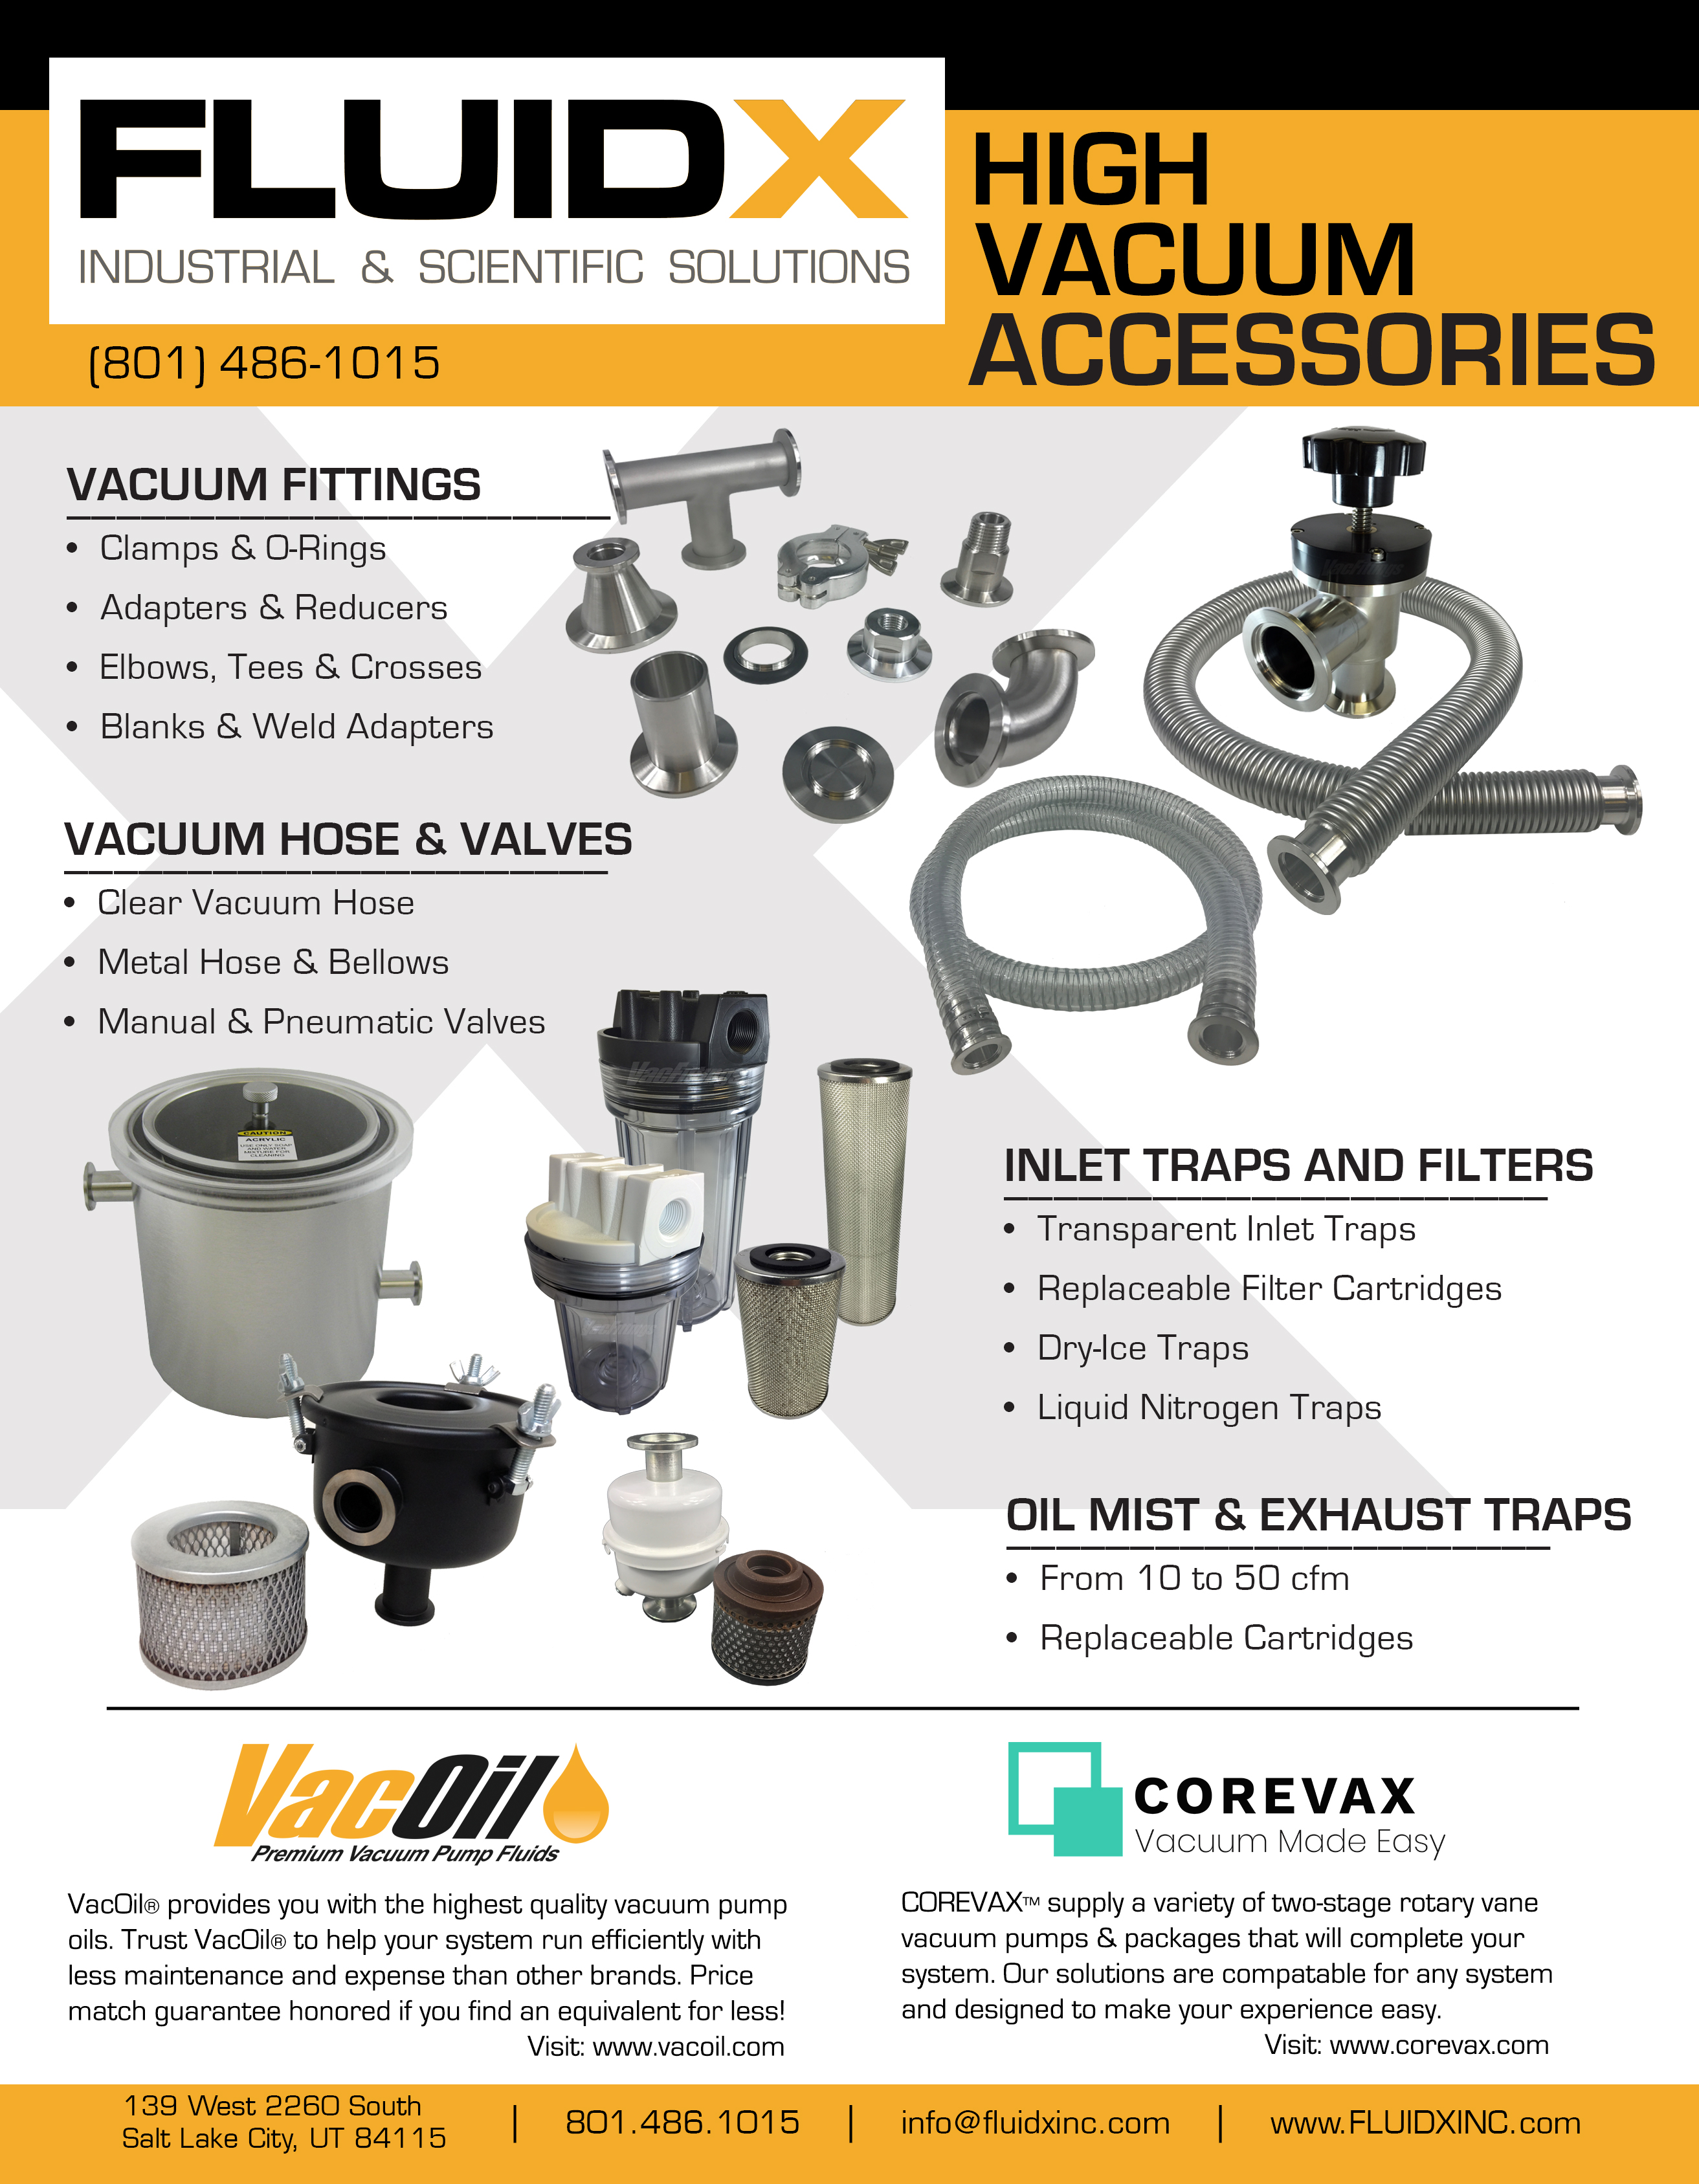 high-vacuum-accessories.jpg